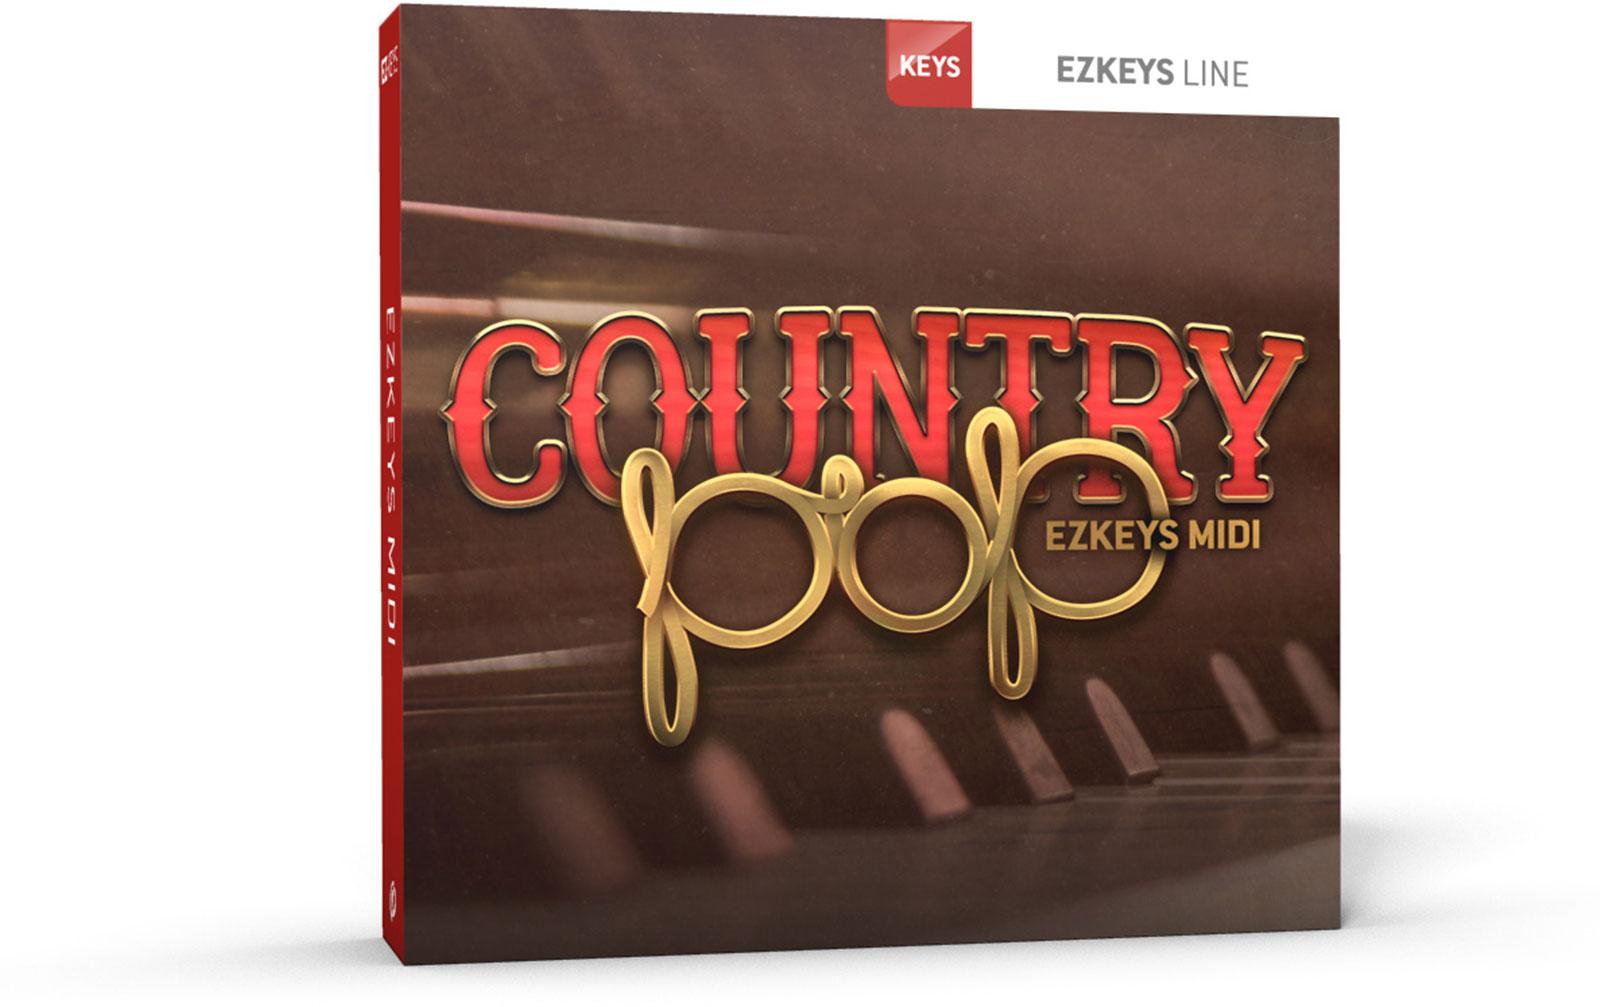 toontrack-ezkeys-country-pop-midi-pack-download-